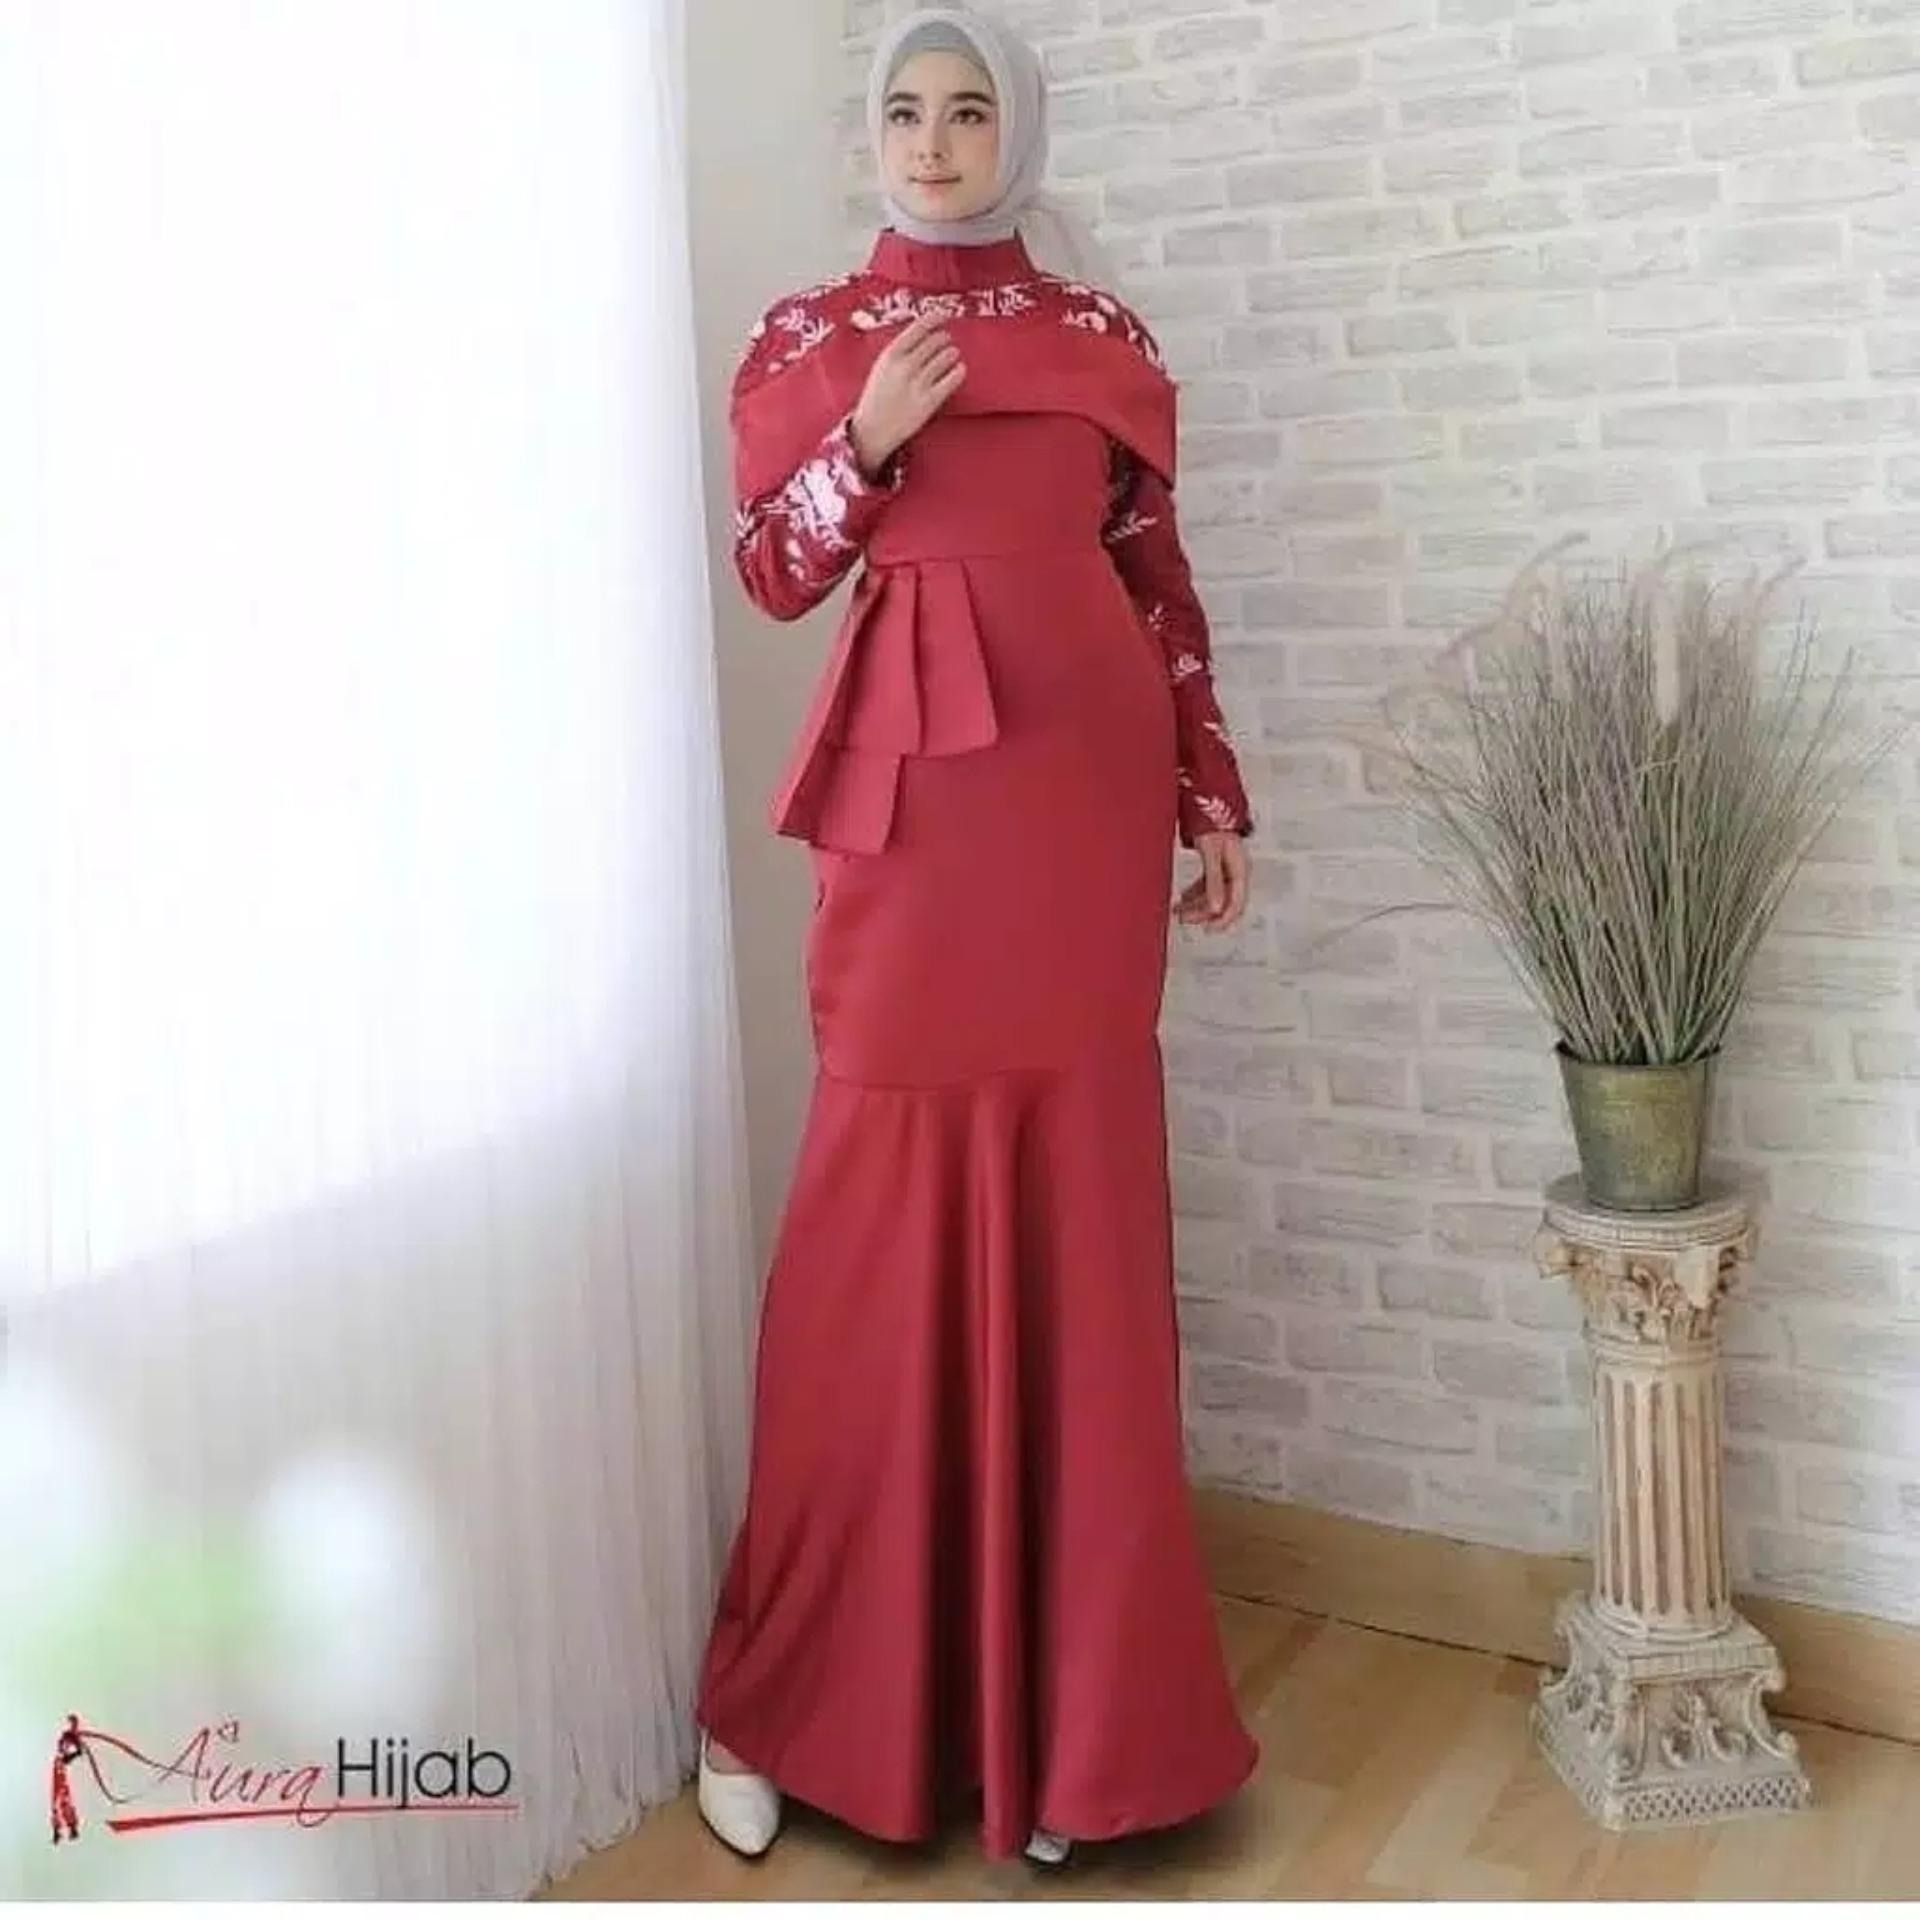 Jakarta Mall - Blouse dan Kemeja Wanita / Setelan Blouse/ Kemeja wanita / Long Dress Maxy / Long Dress Wanita / Gaun Panjang/Gaun Wanita / Tunik Wanita / Dress Muslim / Atasan Muslim / Gamis ; Murah; Motif dan Warna Real Photo #Ukuran M, L dan XL